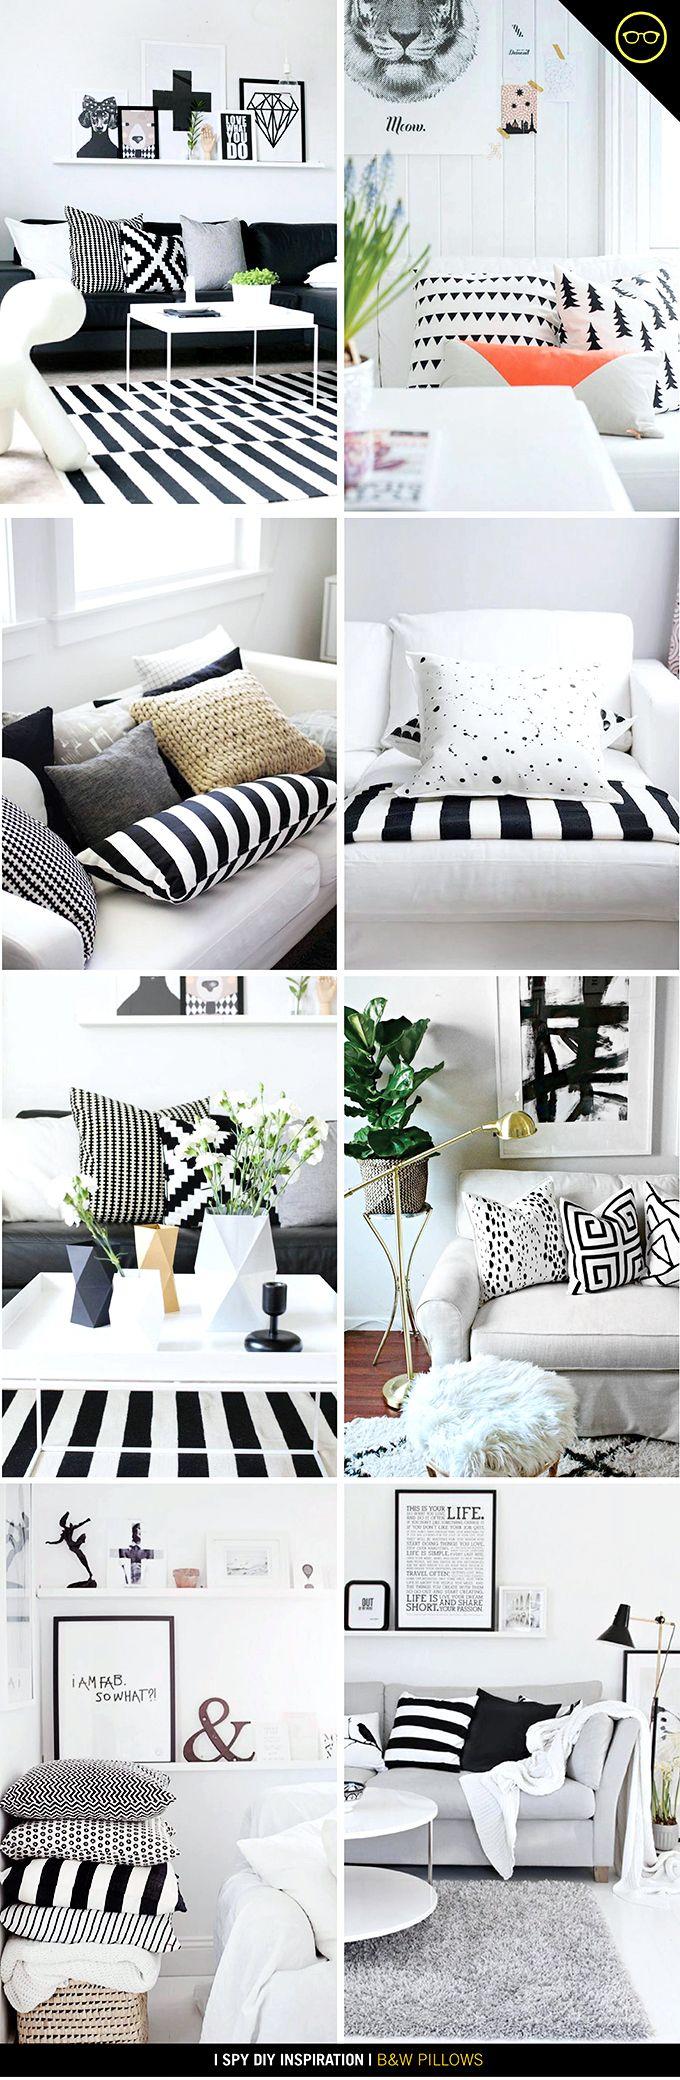 INSPIRATION | B&W Pillows | I SPY DIY